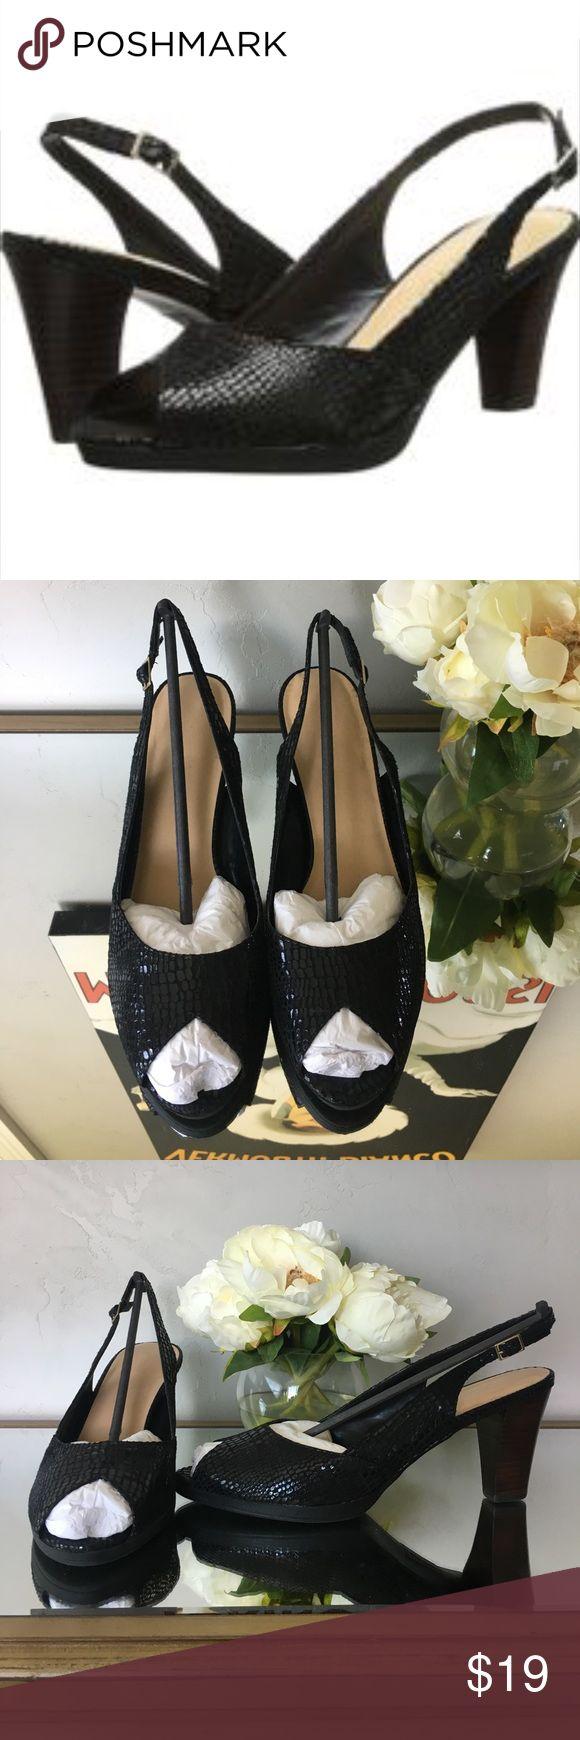 "Bella Vita Liset pump Bella Vita Liset peep toe, sling back pump in black leather print. excellent condition, worn once. 3"" heel, 1/2"" platform. Bella Vita Shoes Heels"